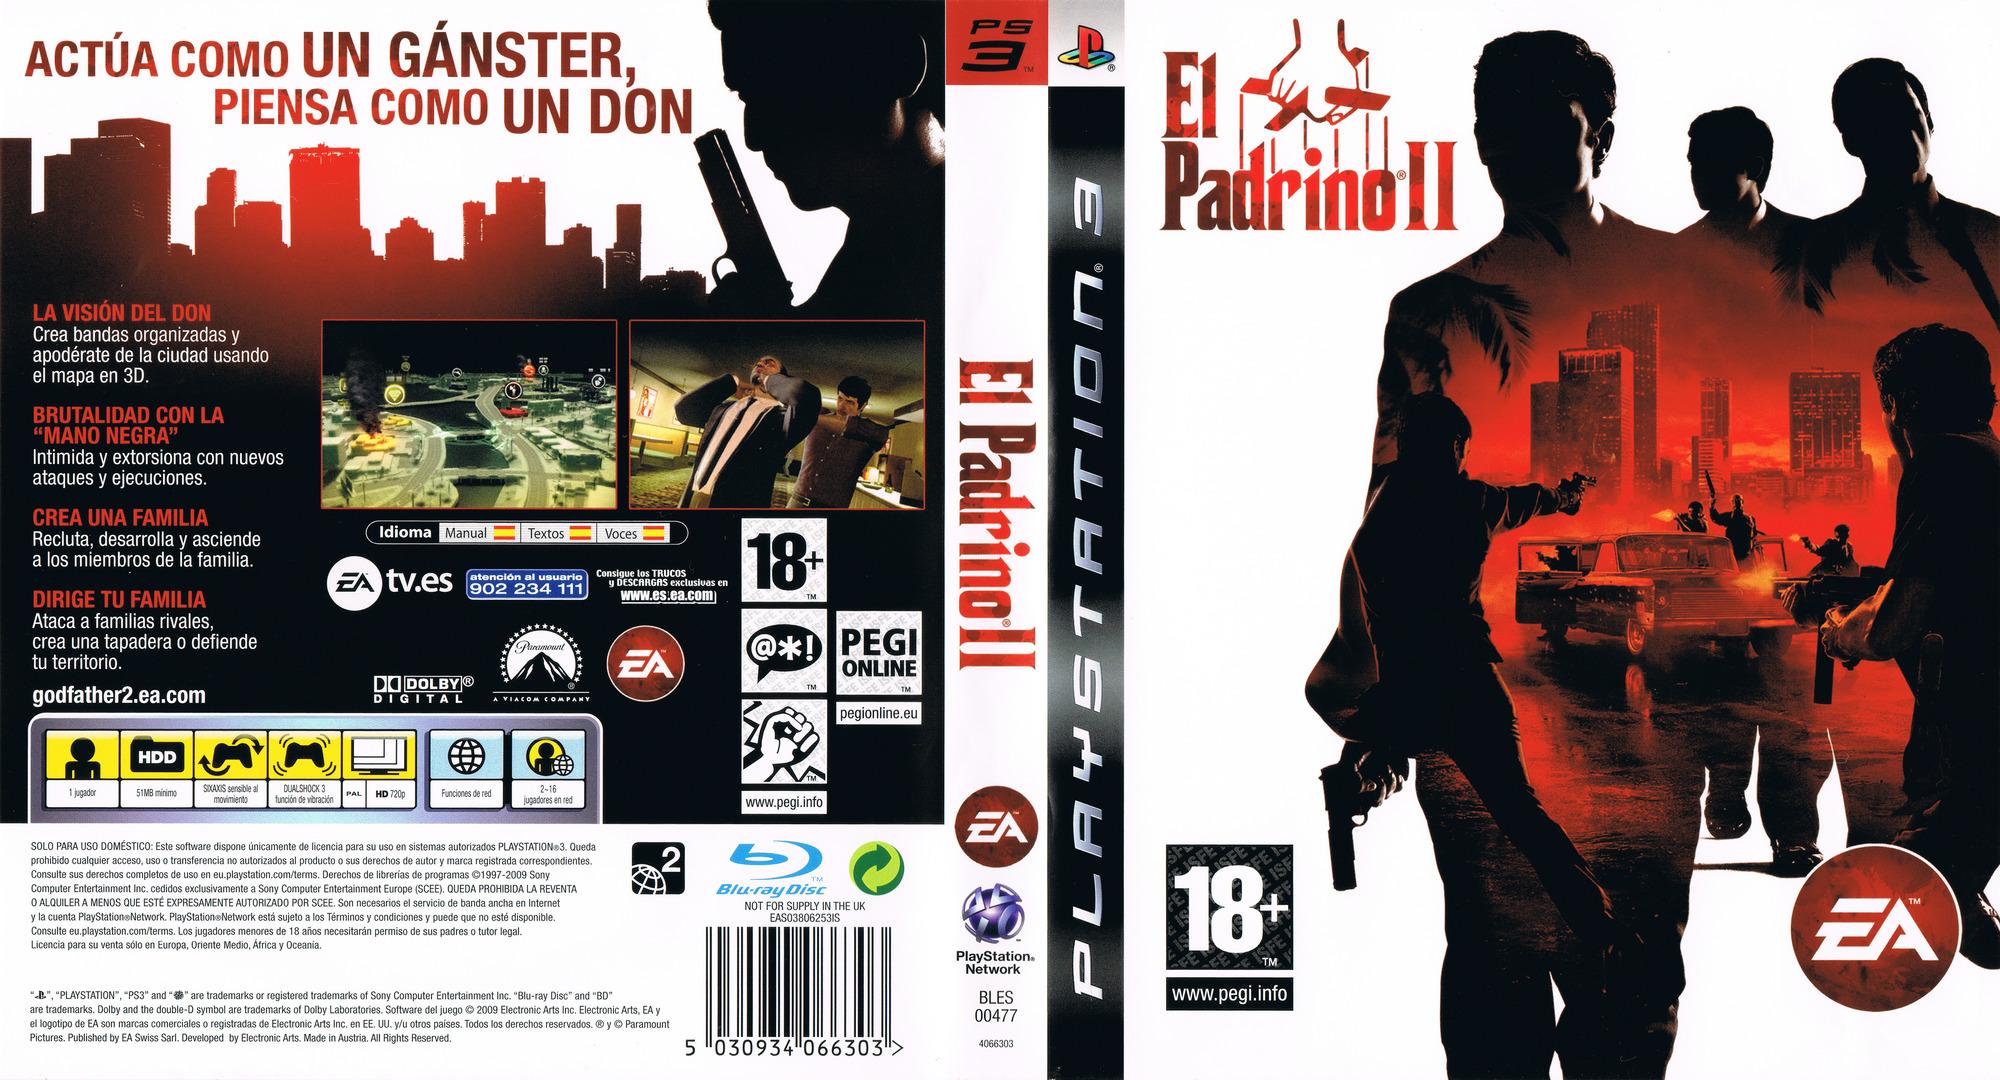 El Padrino II PS3 coverfullHQ (BLES00477)